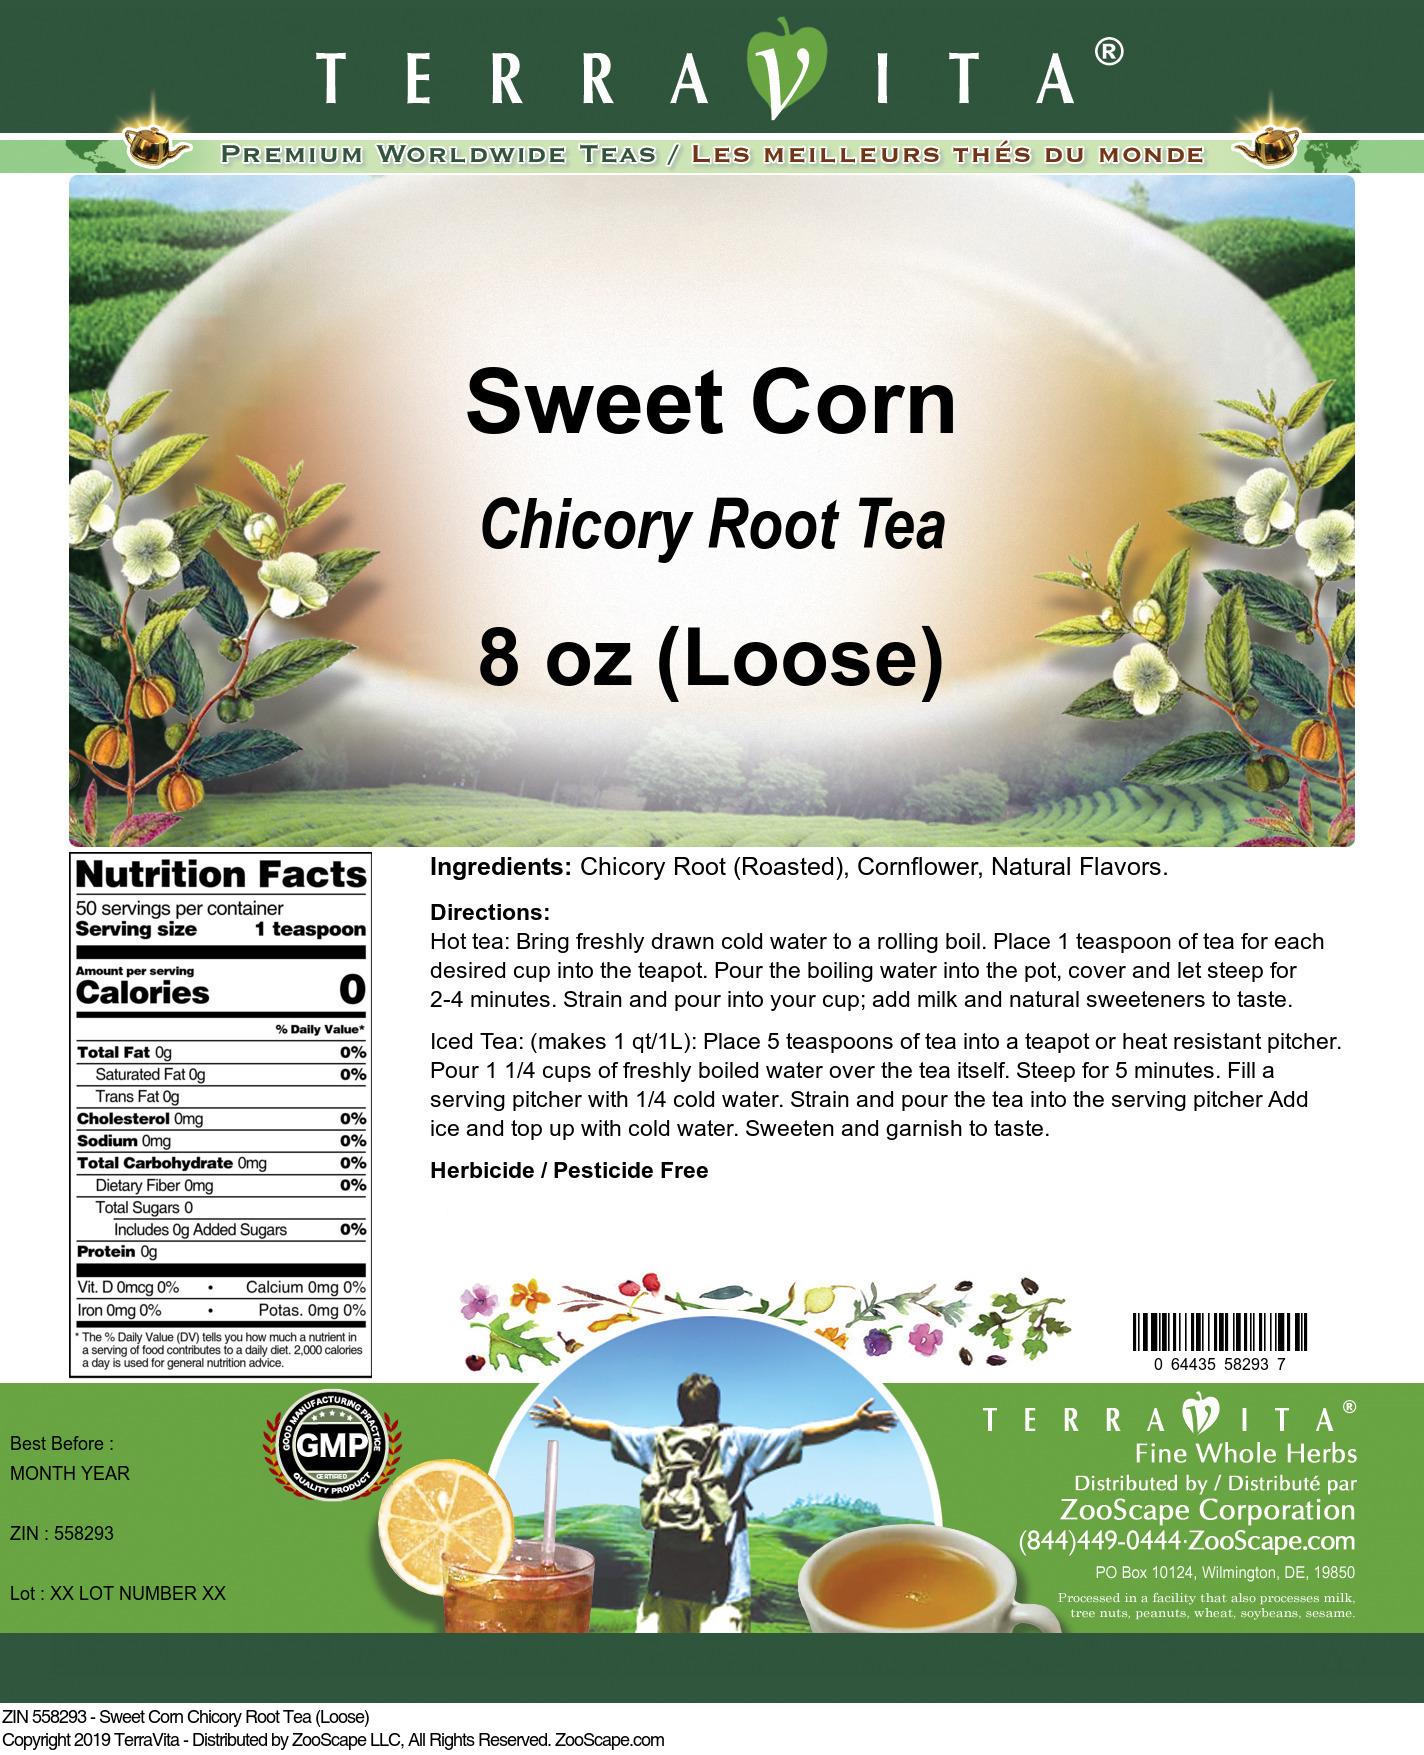 Sweet Corn Chicory Root Tea (Loose)